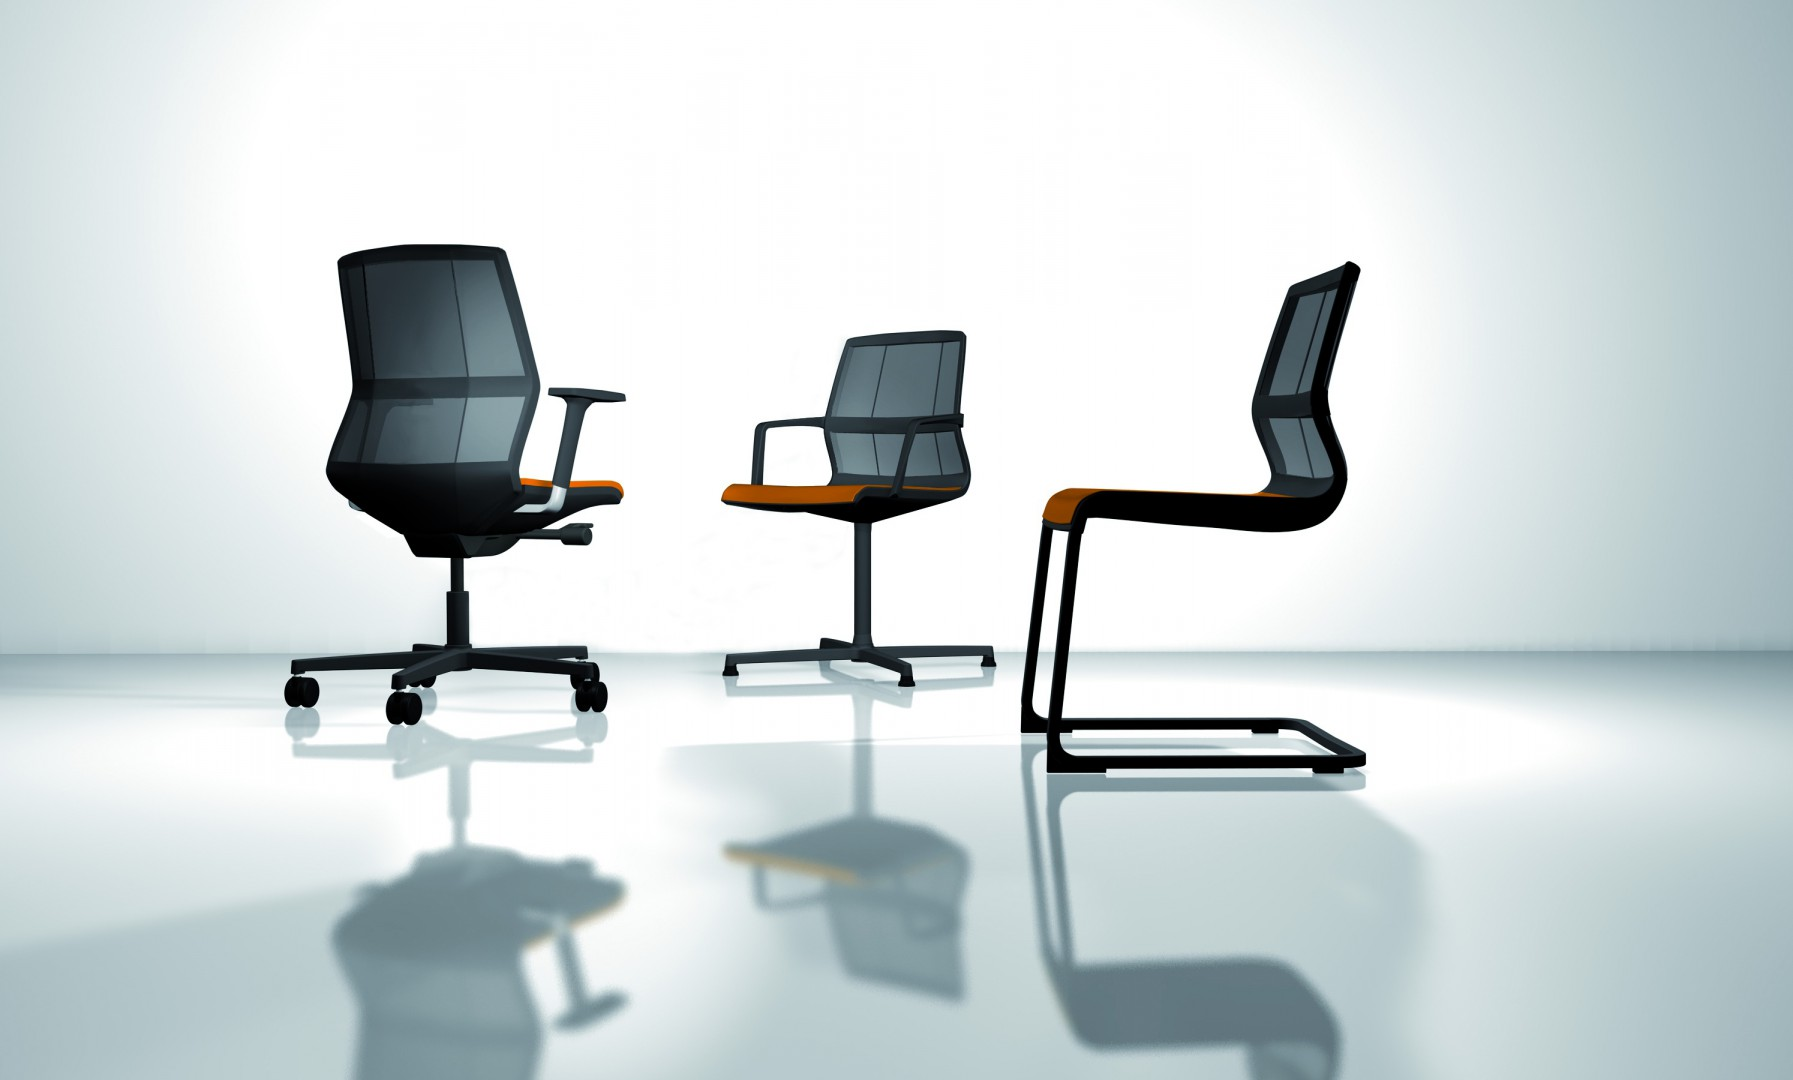 Krzesła i fotele firmy Wiesner Hager. Fot. Archiwum